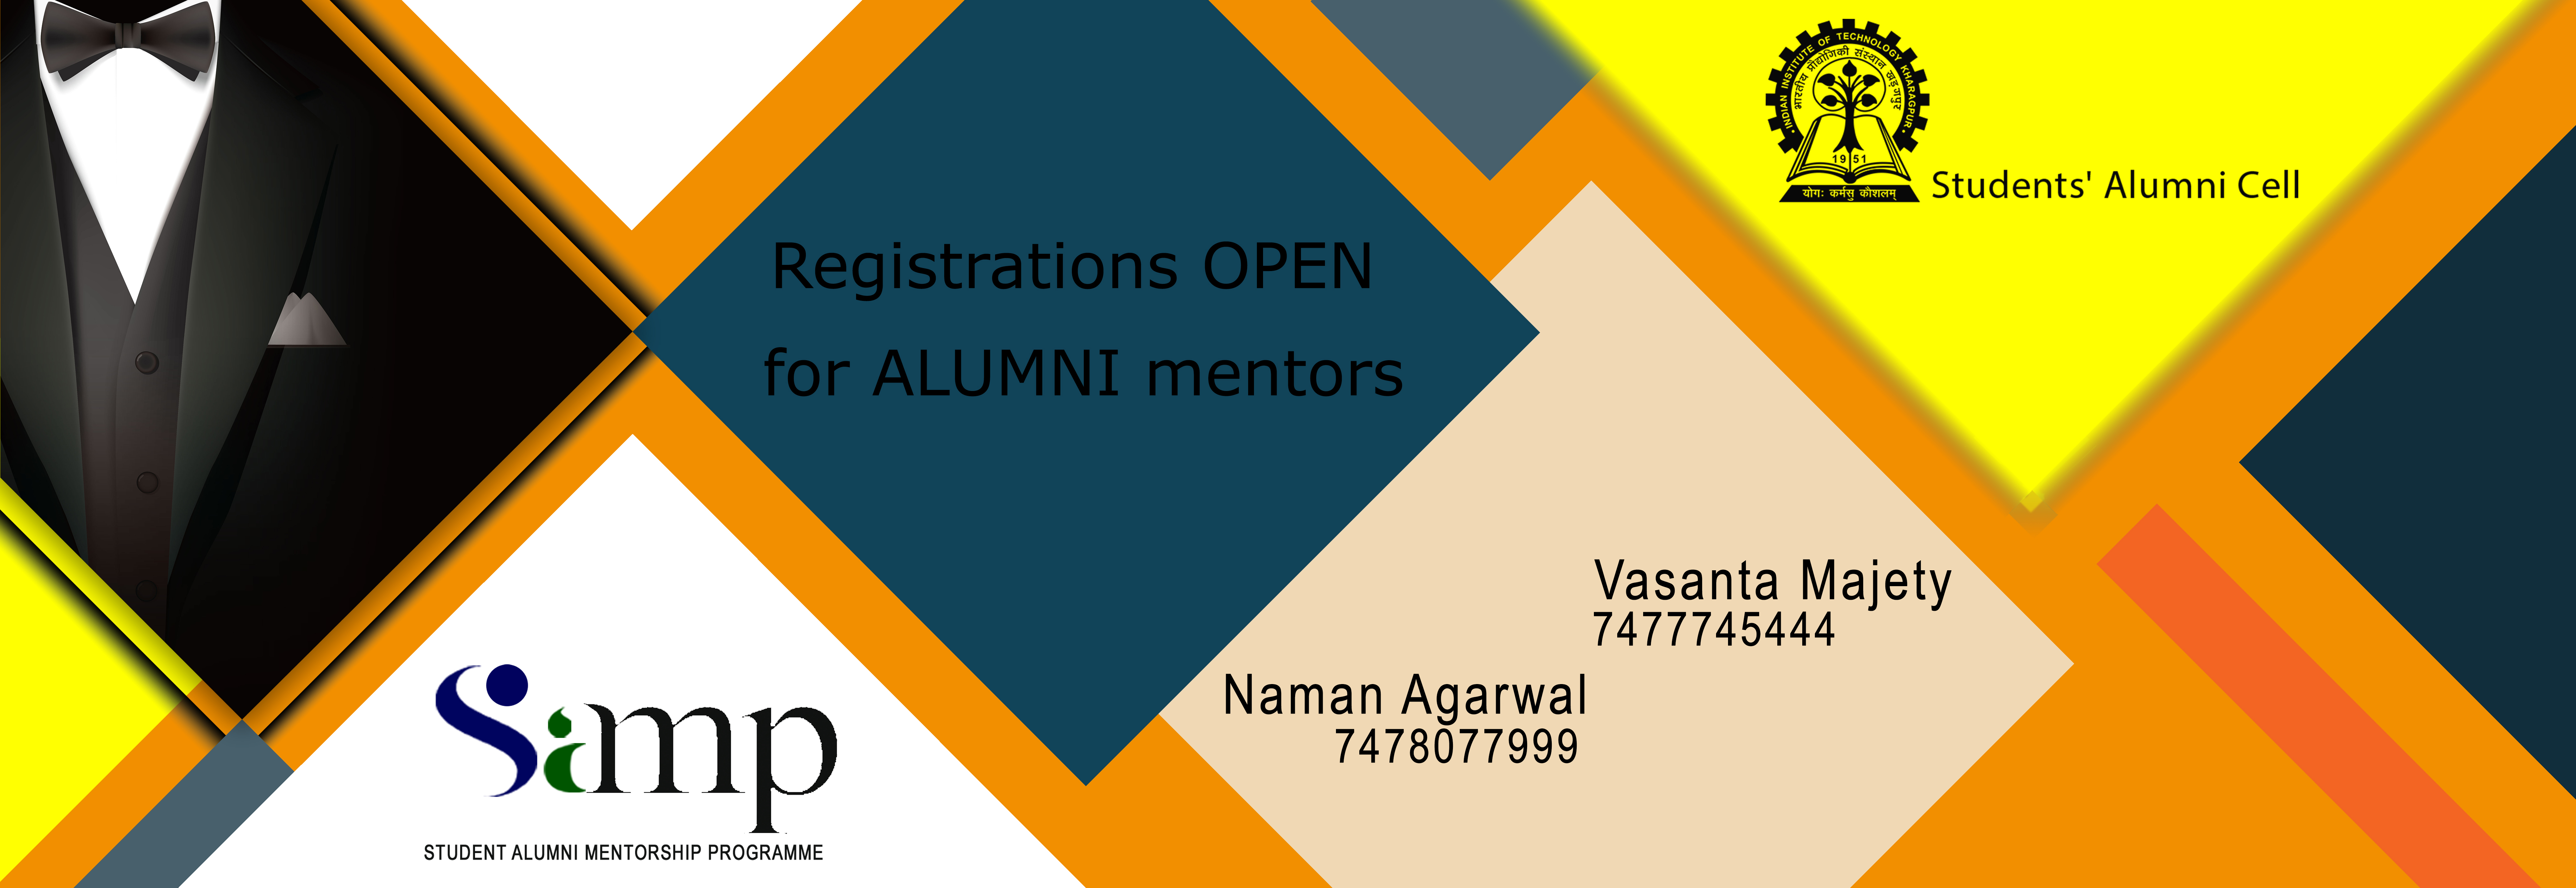 Alumni Registration